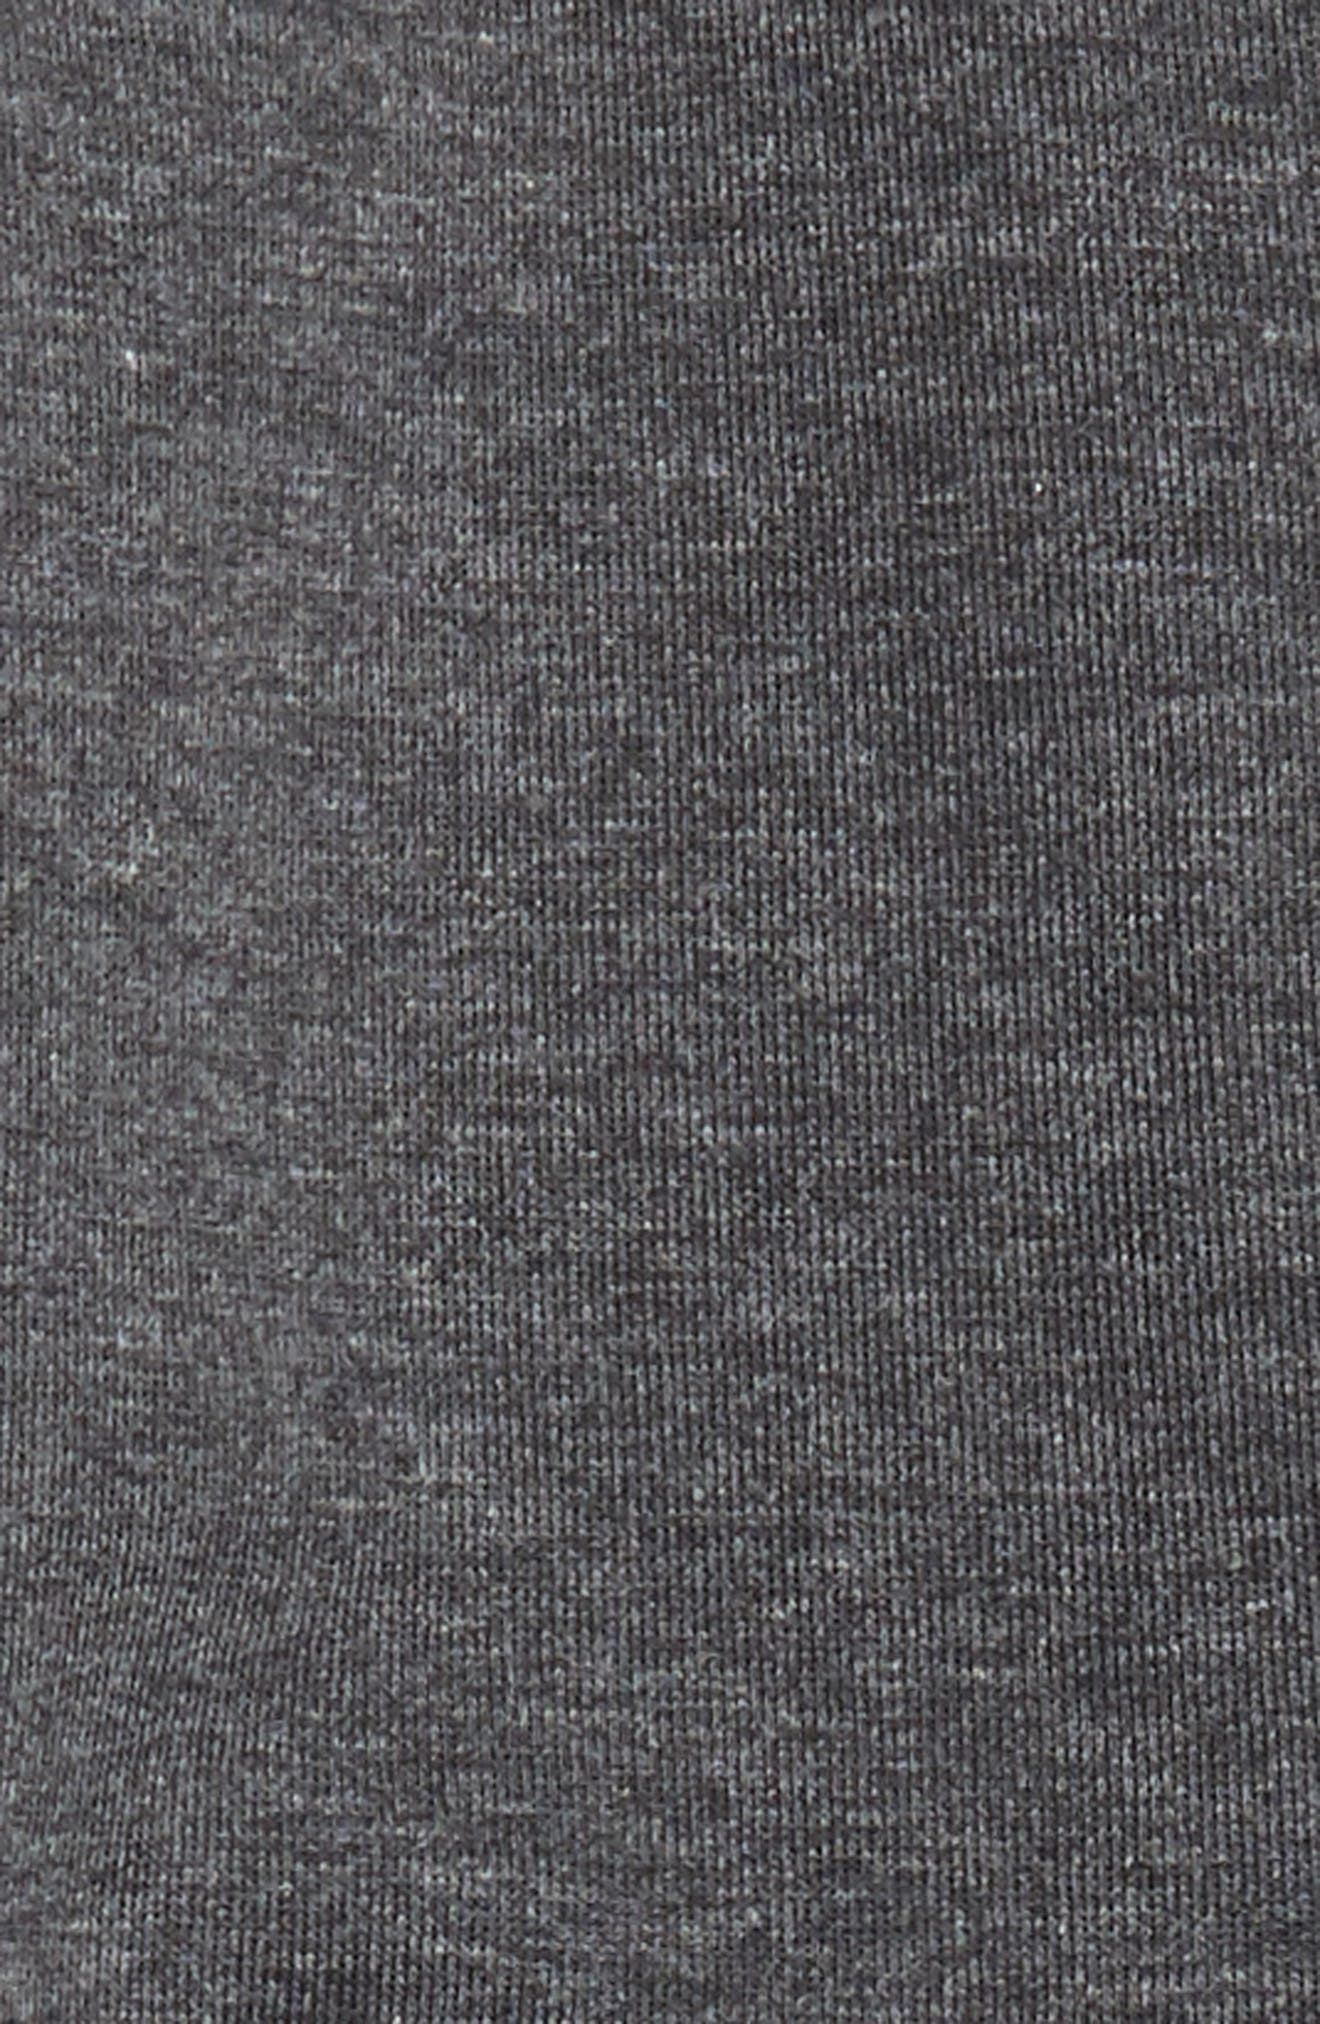 Sportswear Tech Fleece Bomber Jacket,                             Alternate thumbnail 3, color,                             Blk H/ Anthra